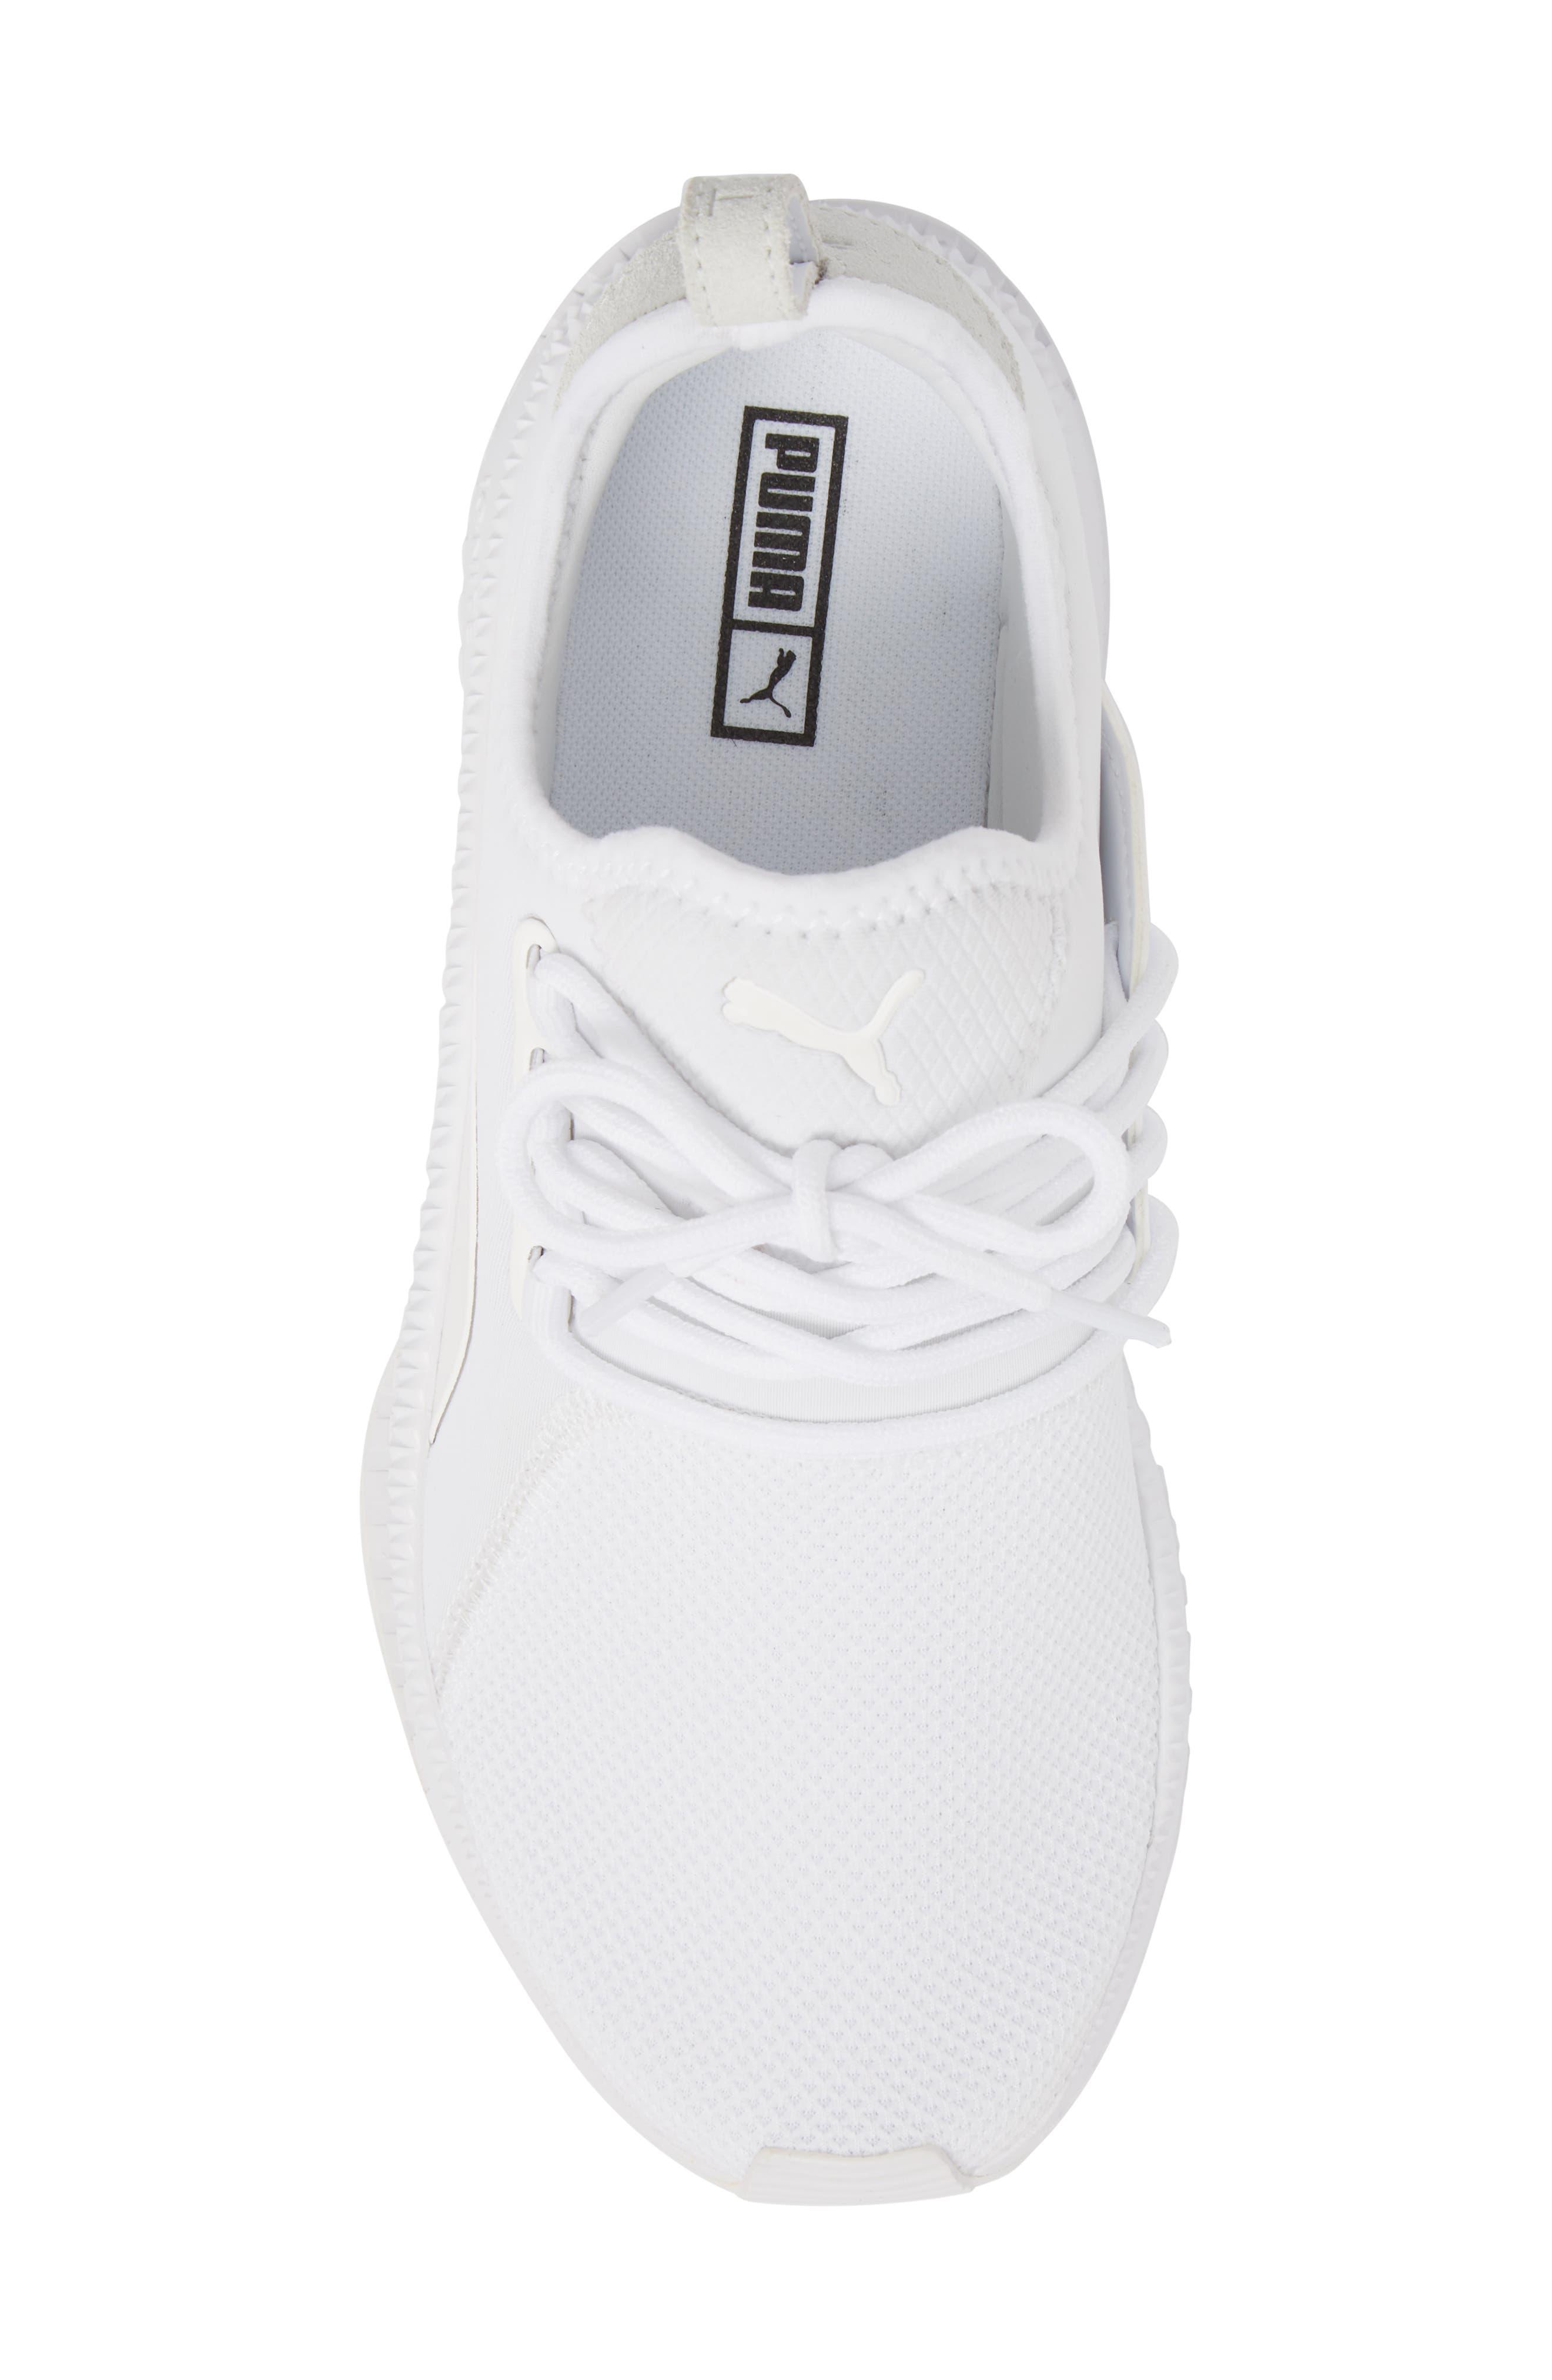 Tsugi Apex Sneaker,                             Alternate thumbnail 5, color,                             White/ White